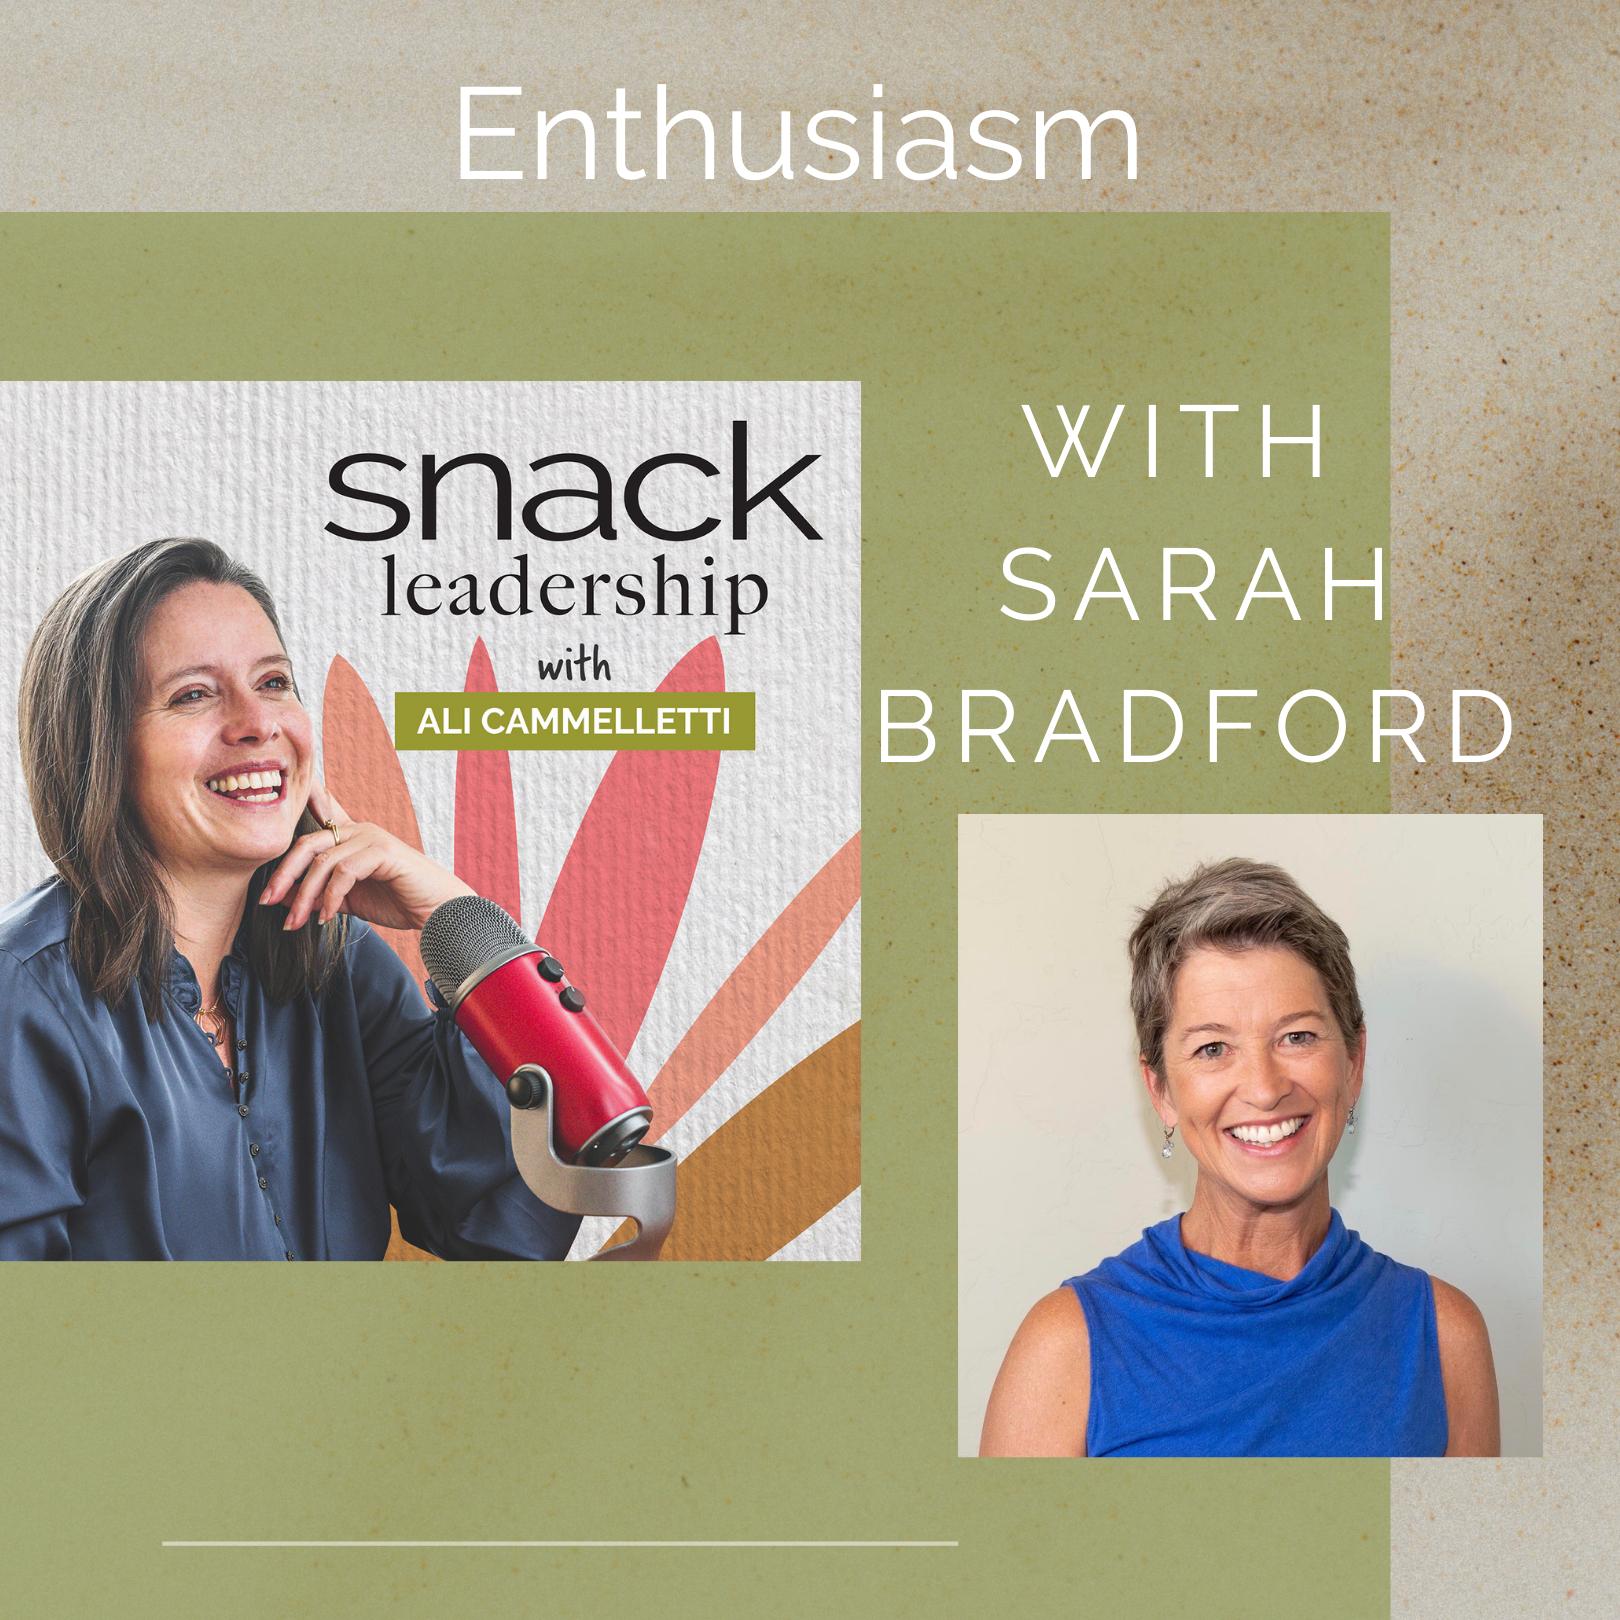 Ep 22 – Enthusiasm with Sarah Bradford